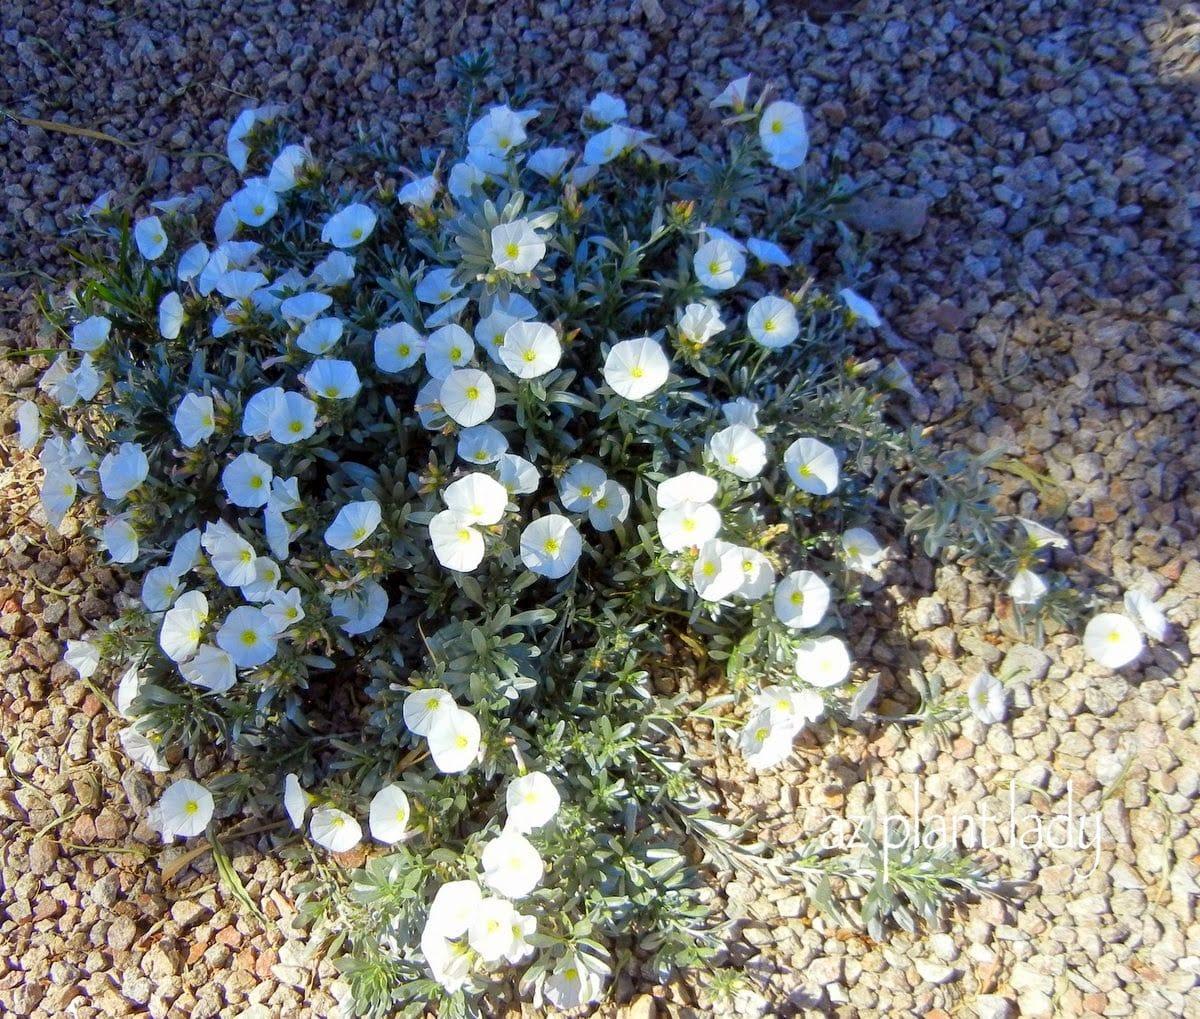 White Flowering Plants For The Southwest Landscape Part 1